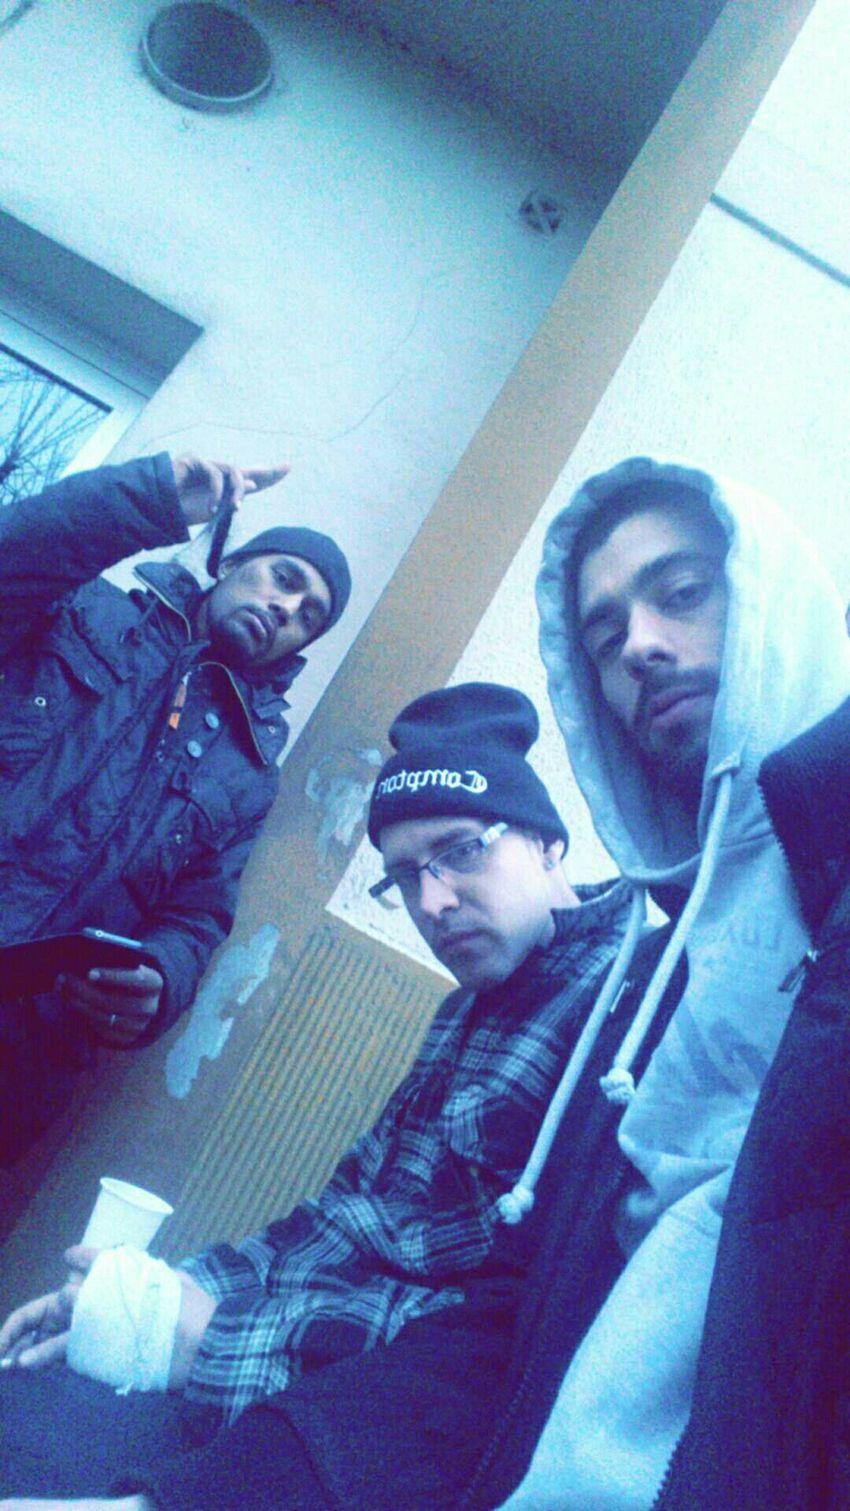 La pose imposé! Frenchcloutboyz Smokeweedeveryday Black Koff Moici Bang Bang Squadddd Followme Snapchat